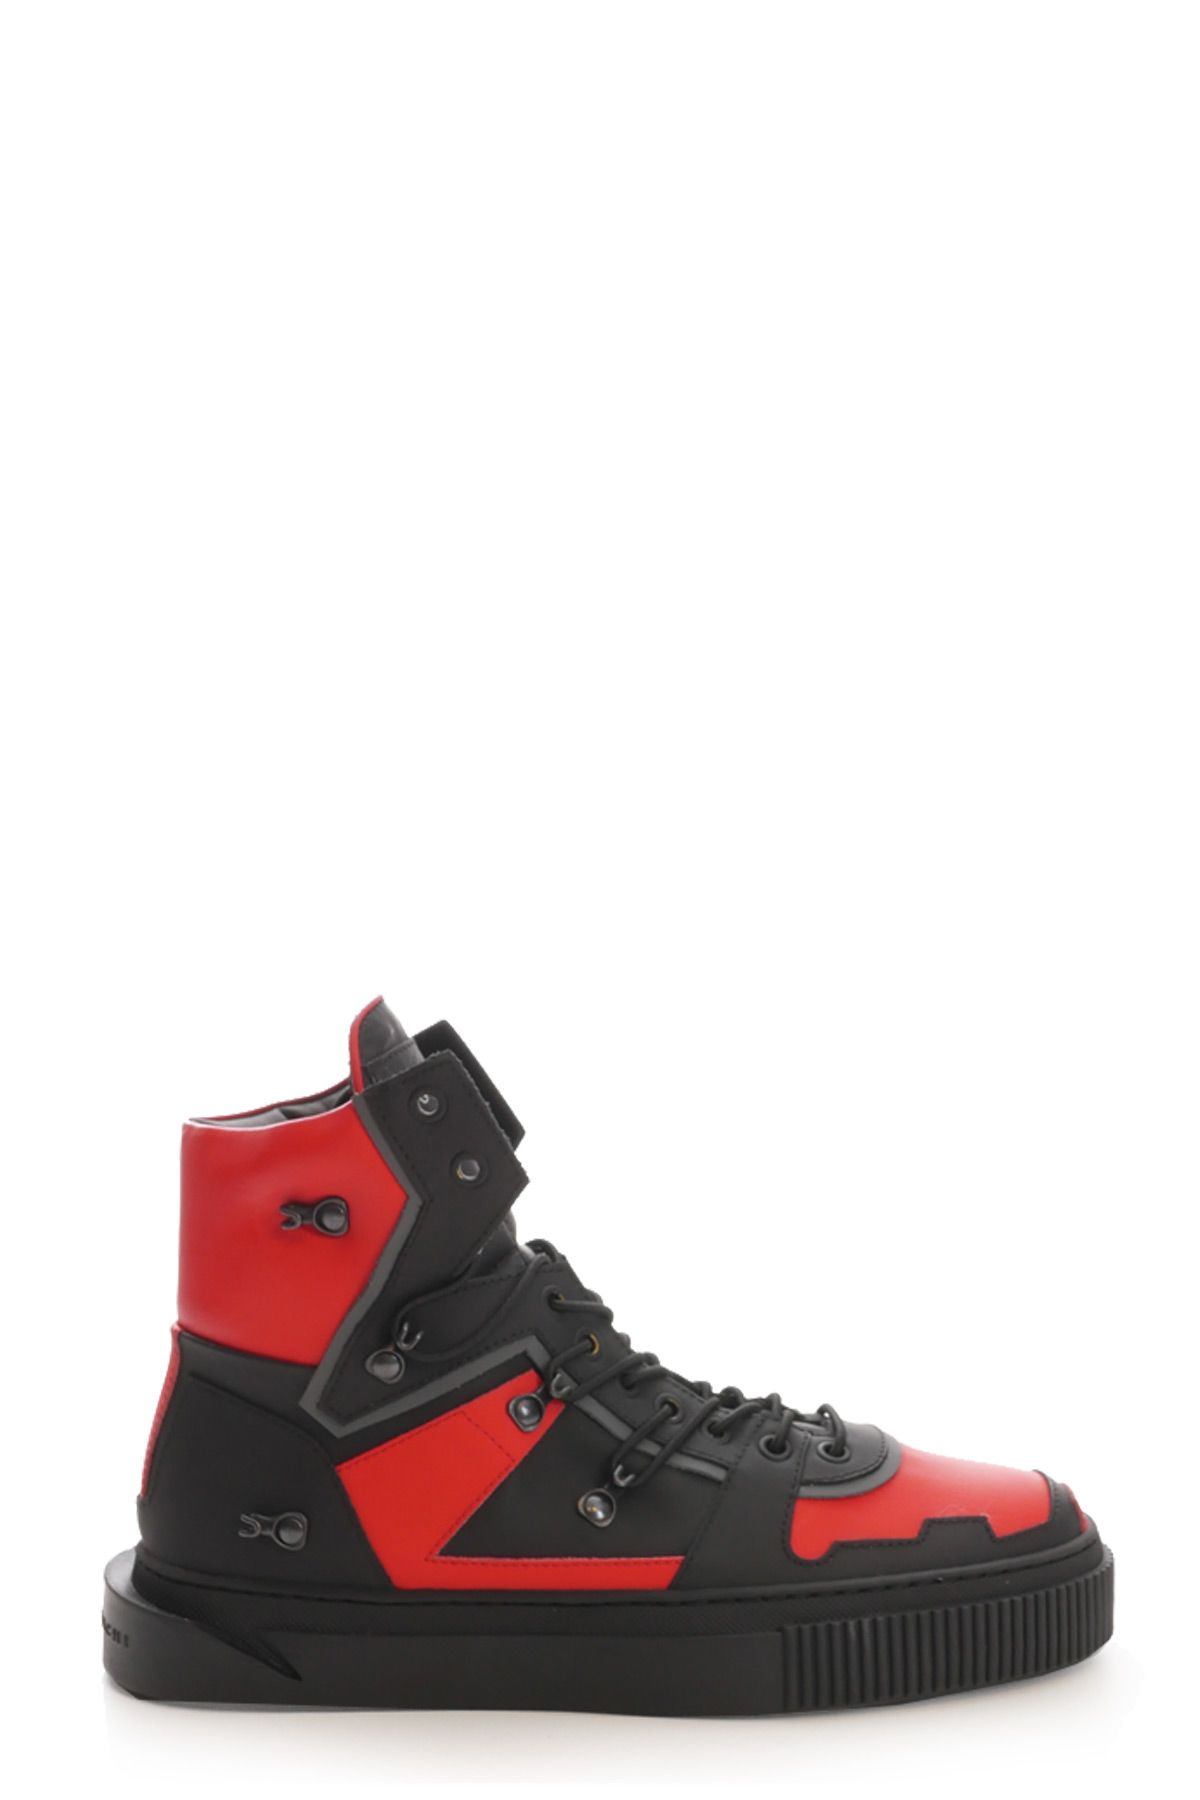 GIENCHI Sneakers in Nero/Rosso